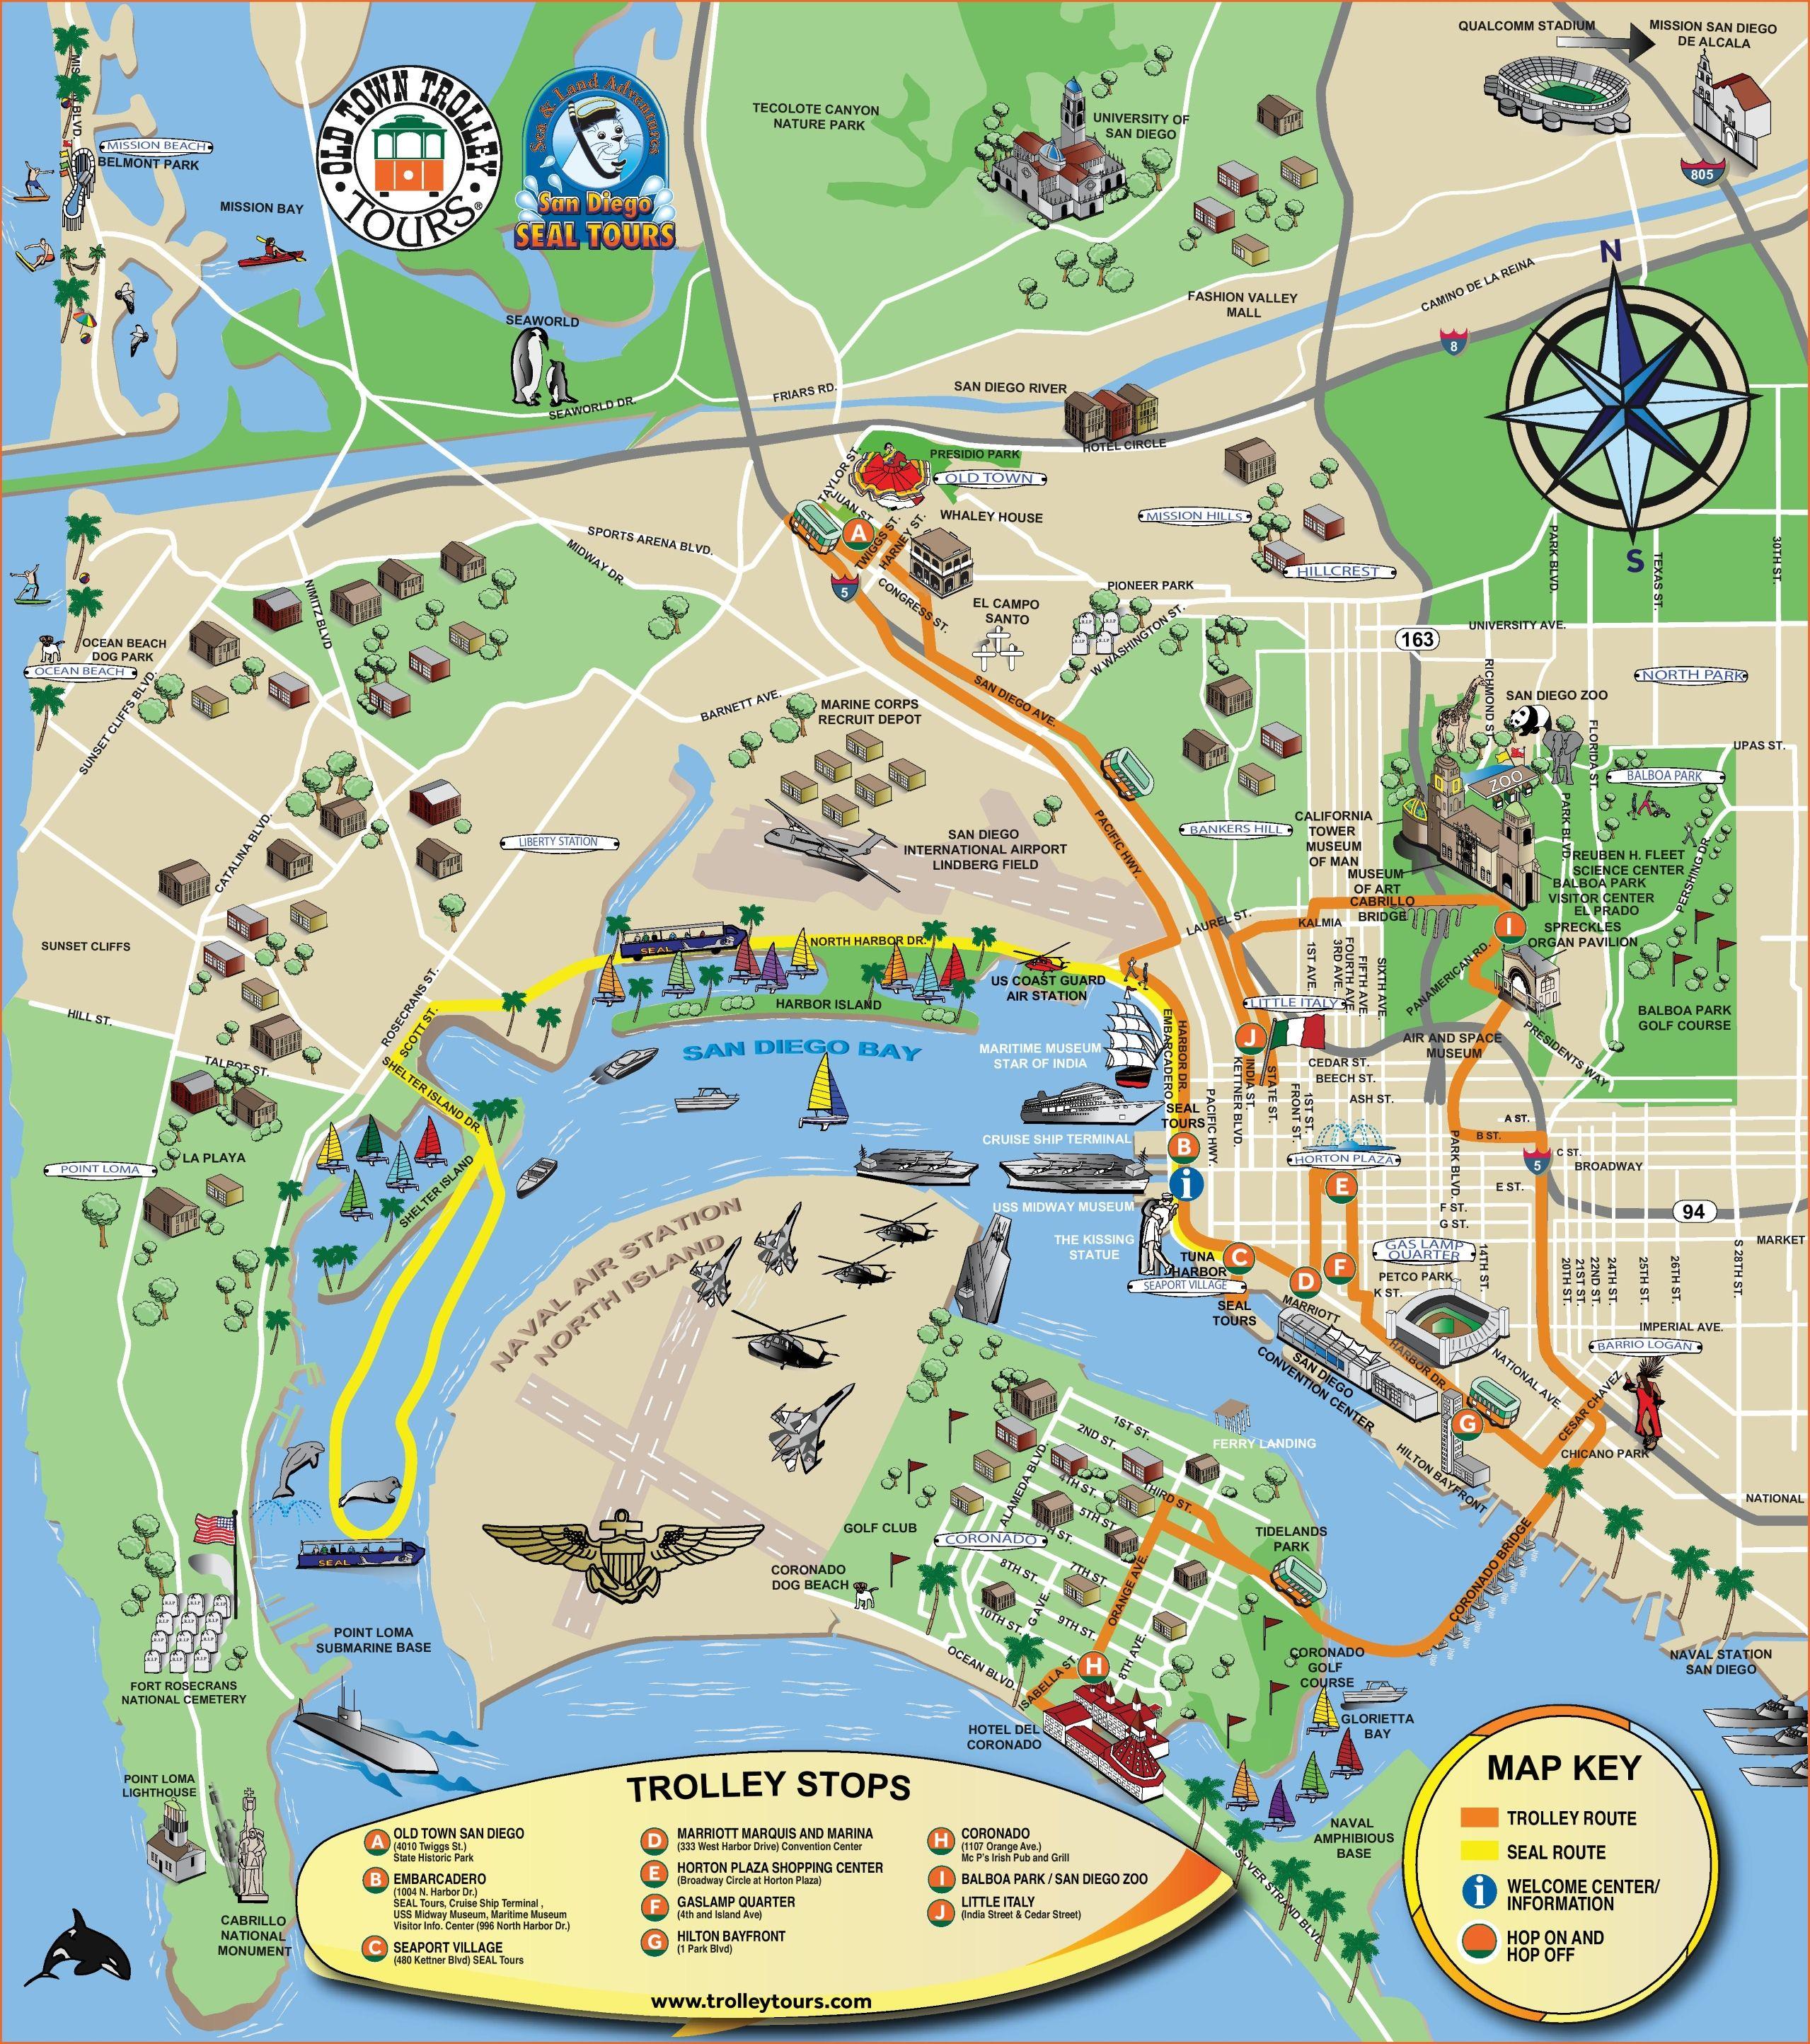 San Diego tourist attractions map | San Diego trip ...